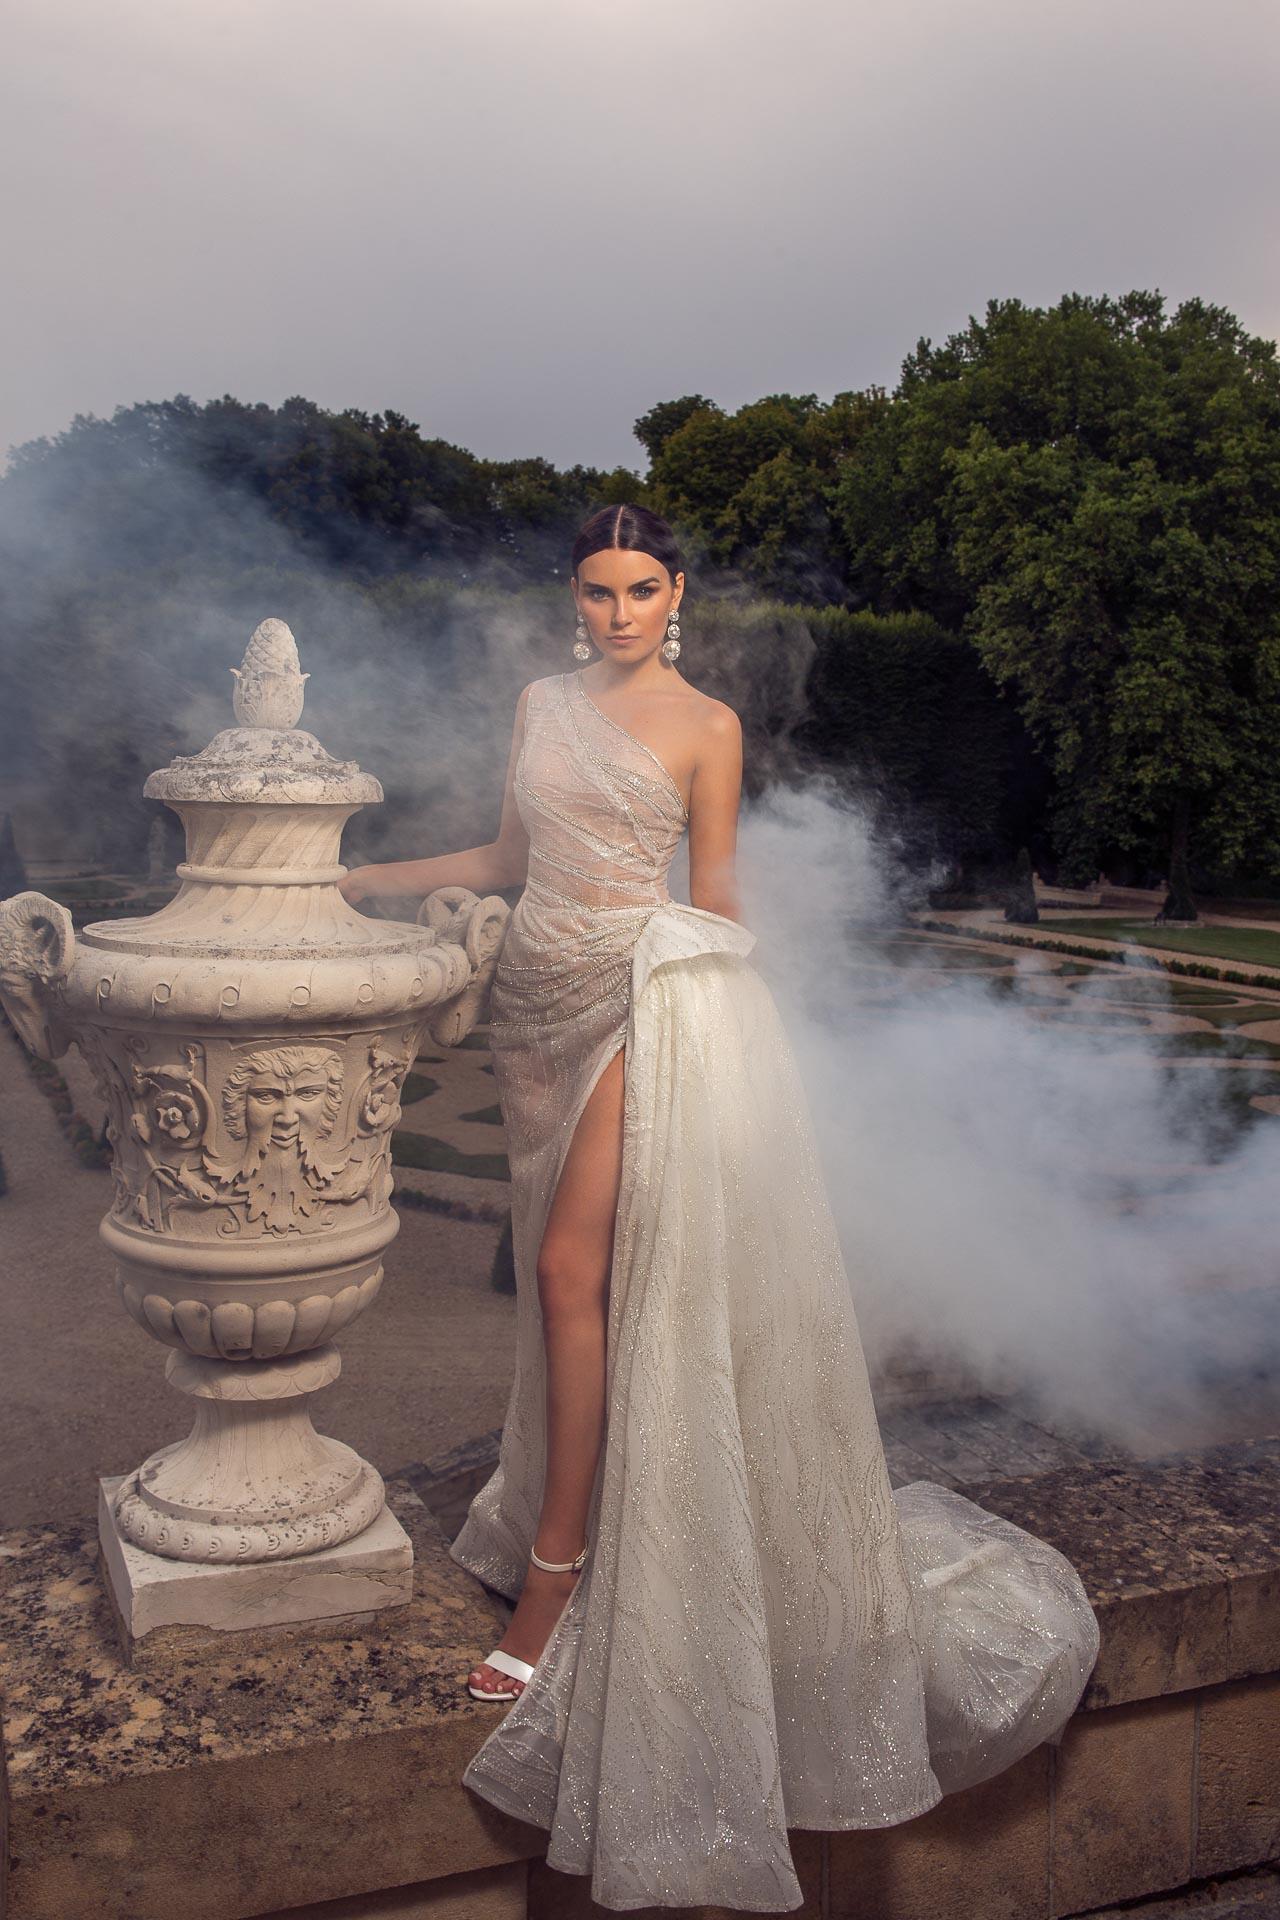 Chateau de Villette luxury private property near Paris best wedding event venue high quality exclusive services park ceremony bridal couture gown luxurious dress The Heritage Collection